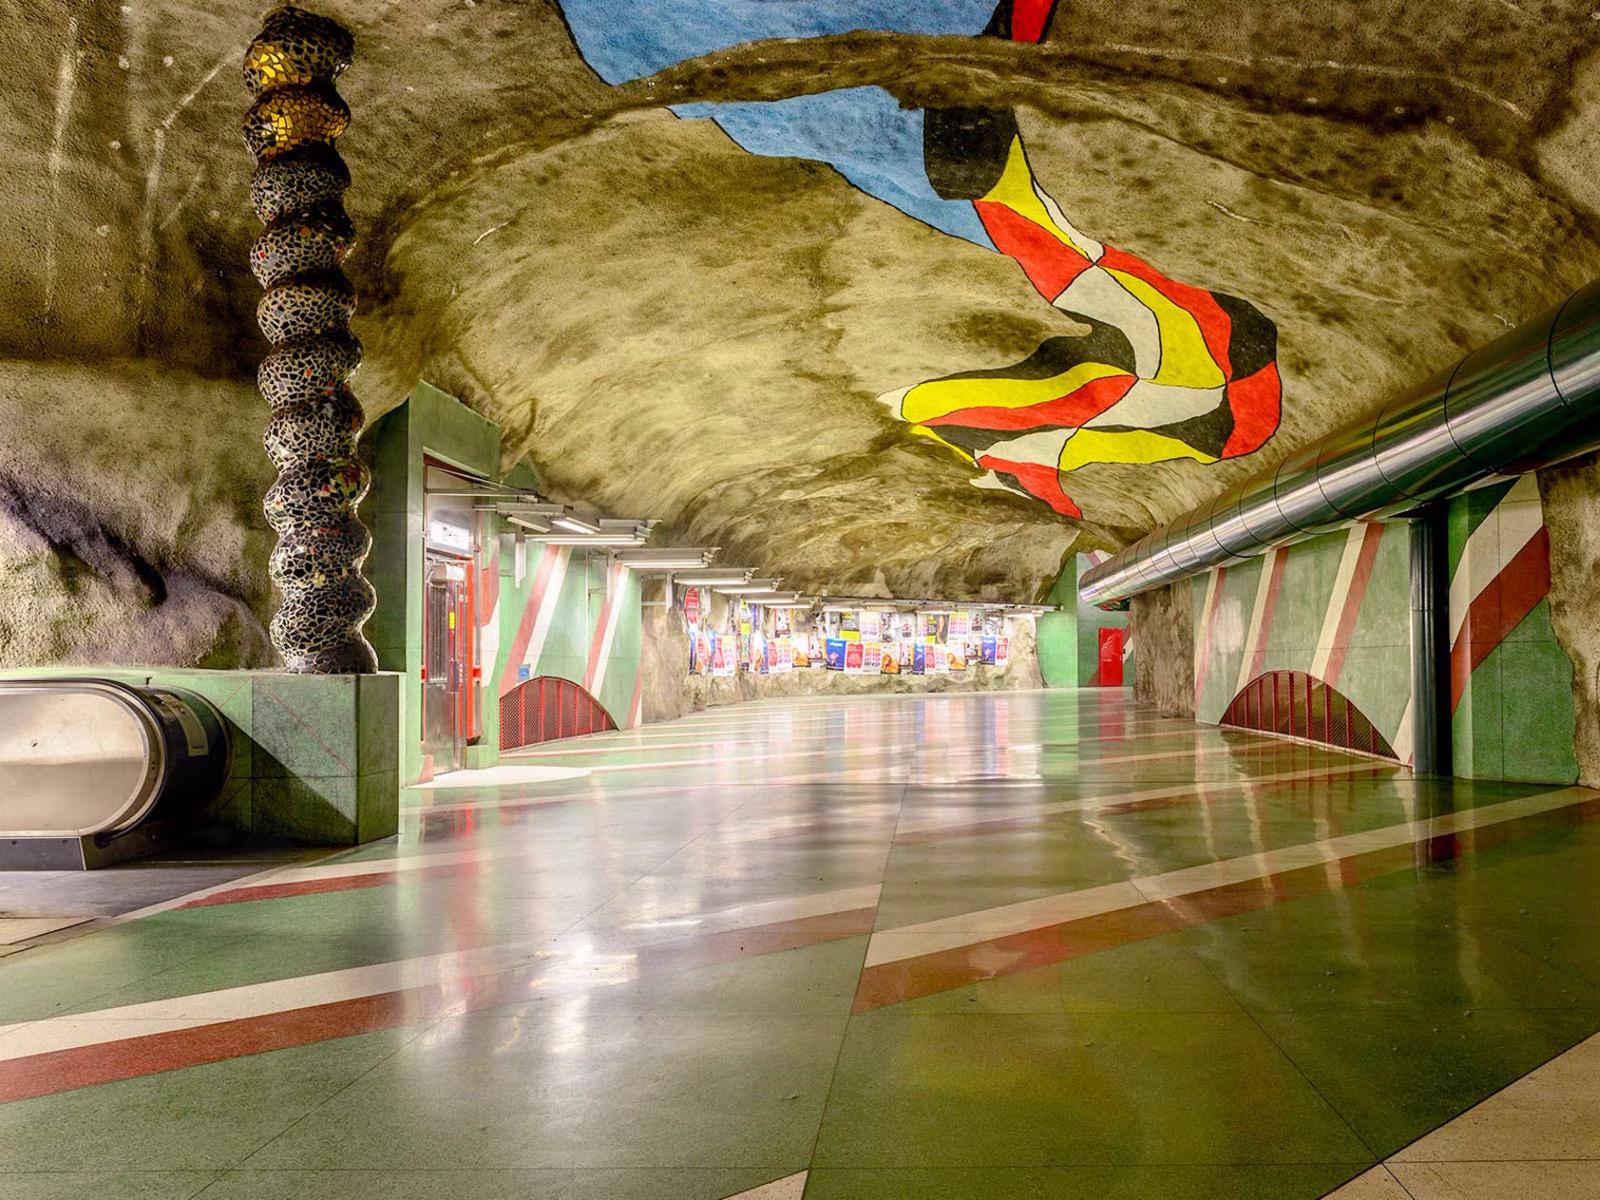 Photo 1 of 10 in Explore the Stockholm Metro For a Tour Through 5 Decades of European Art History